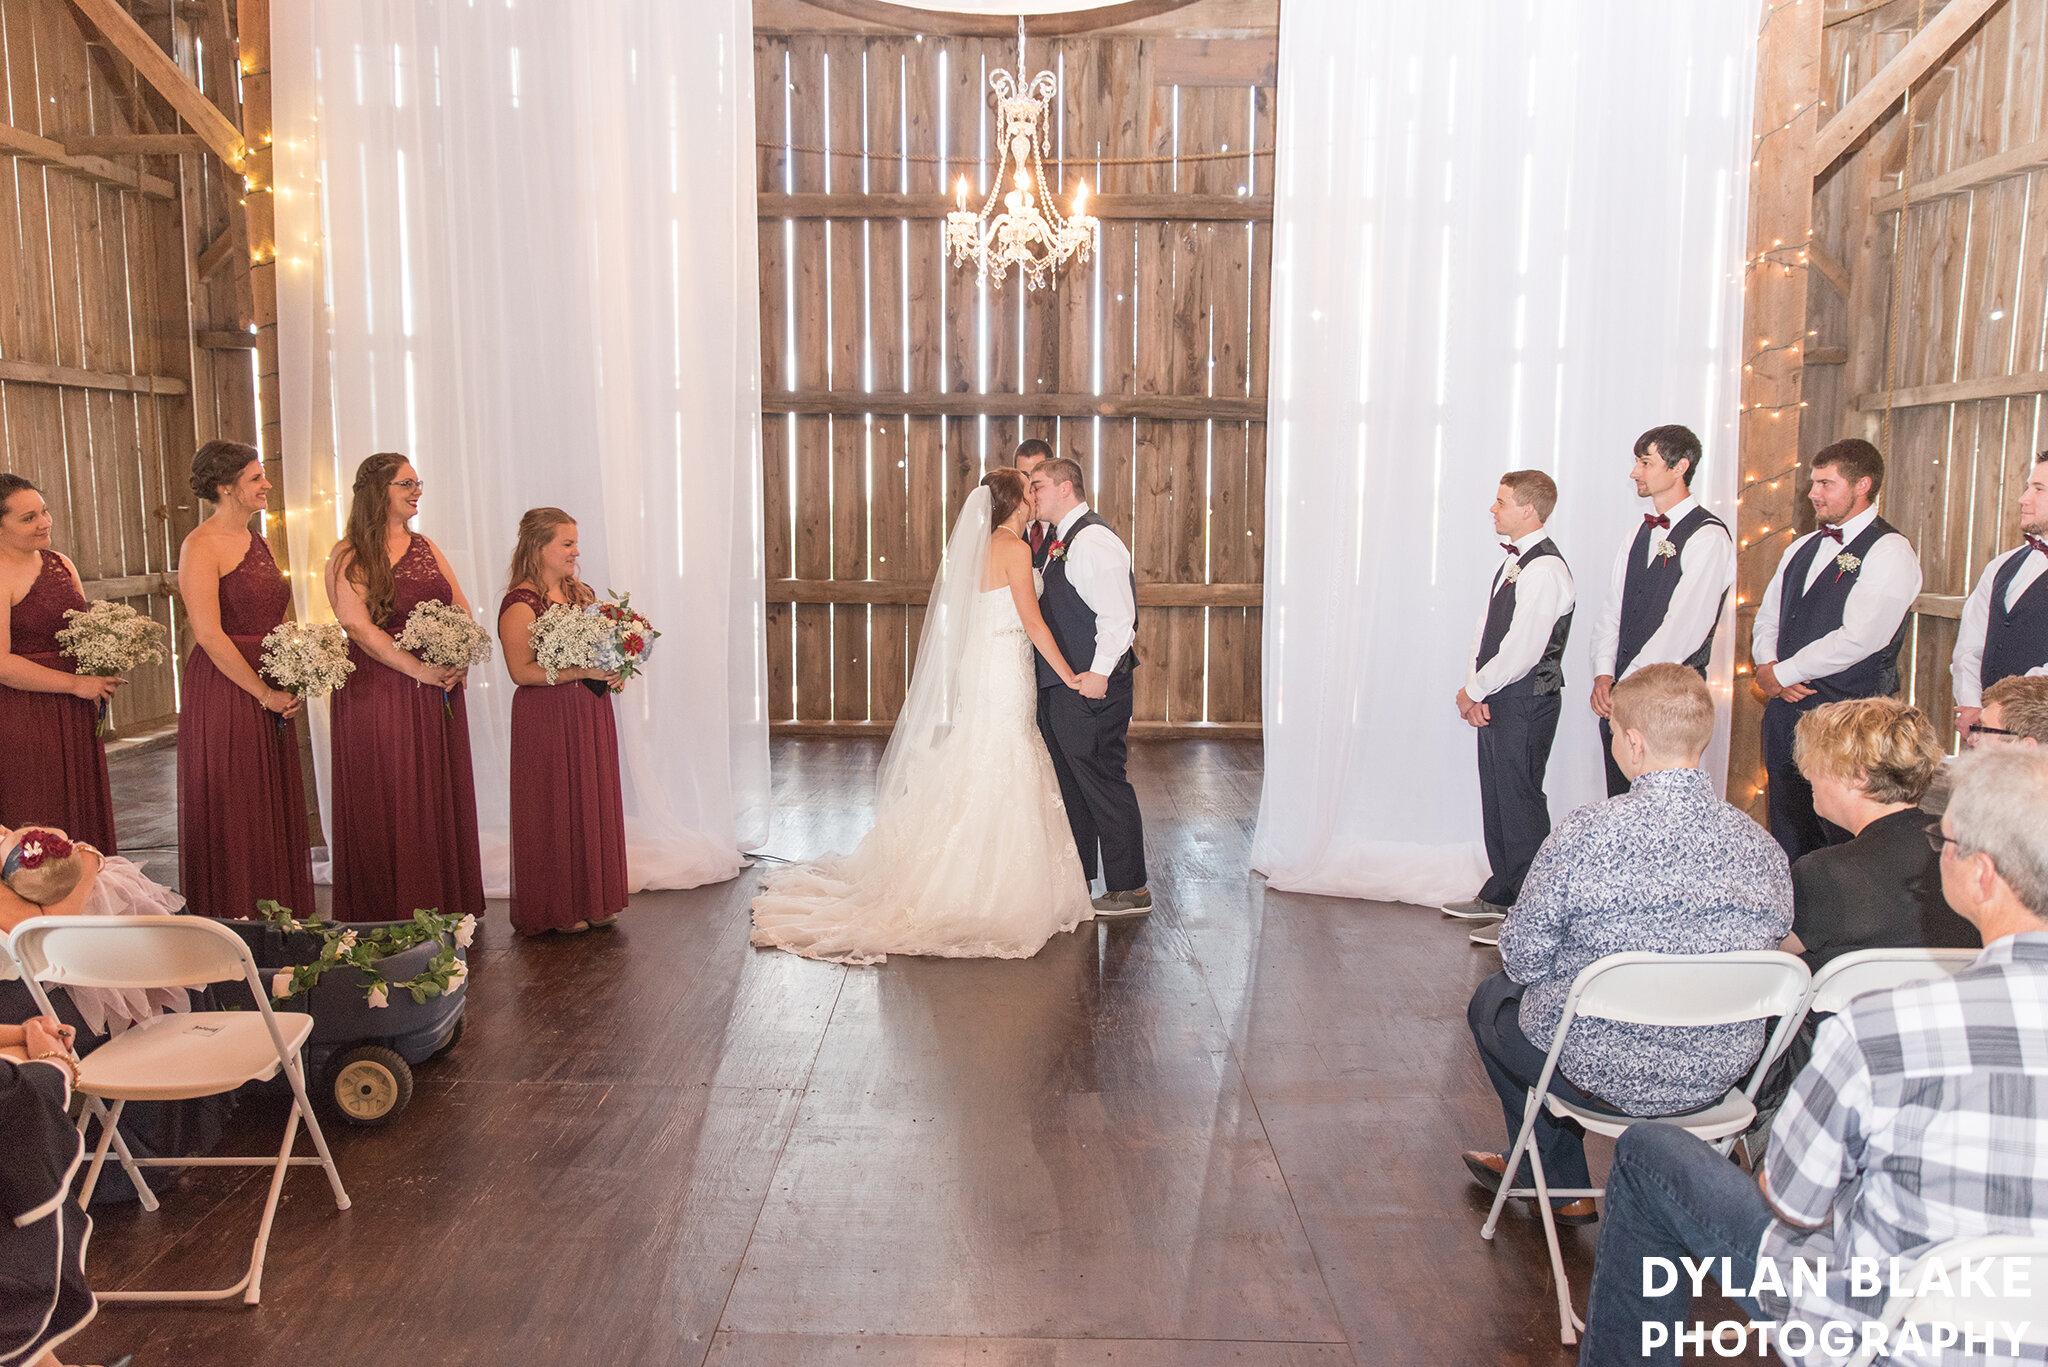 ryan-and-billy-brighton-acres-wedding0021.jpg